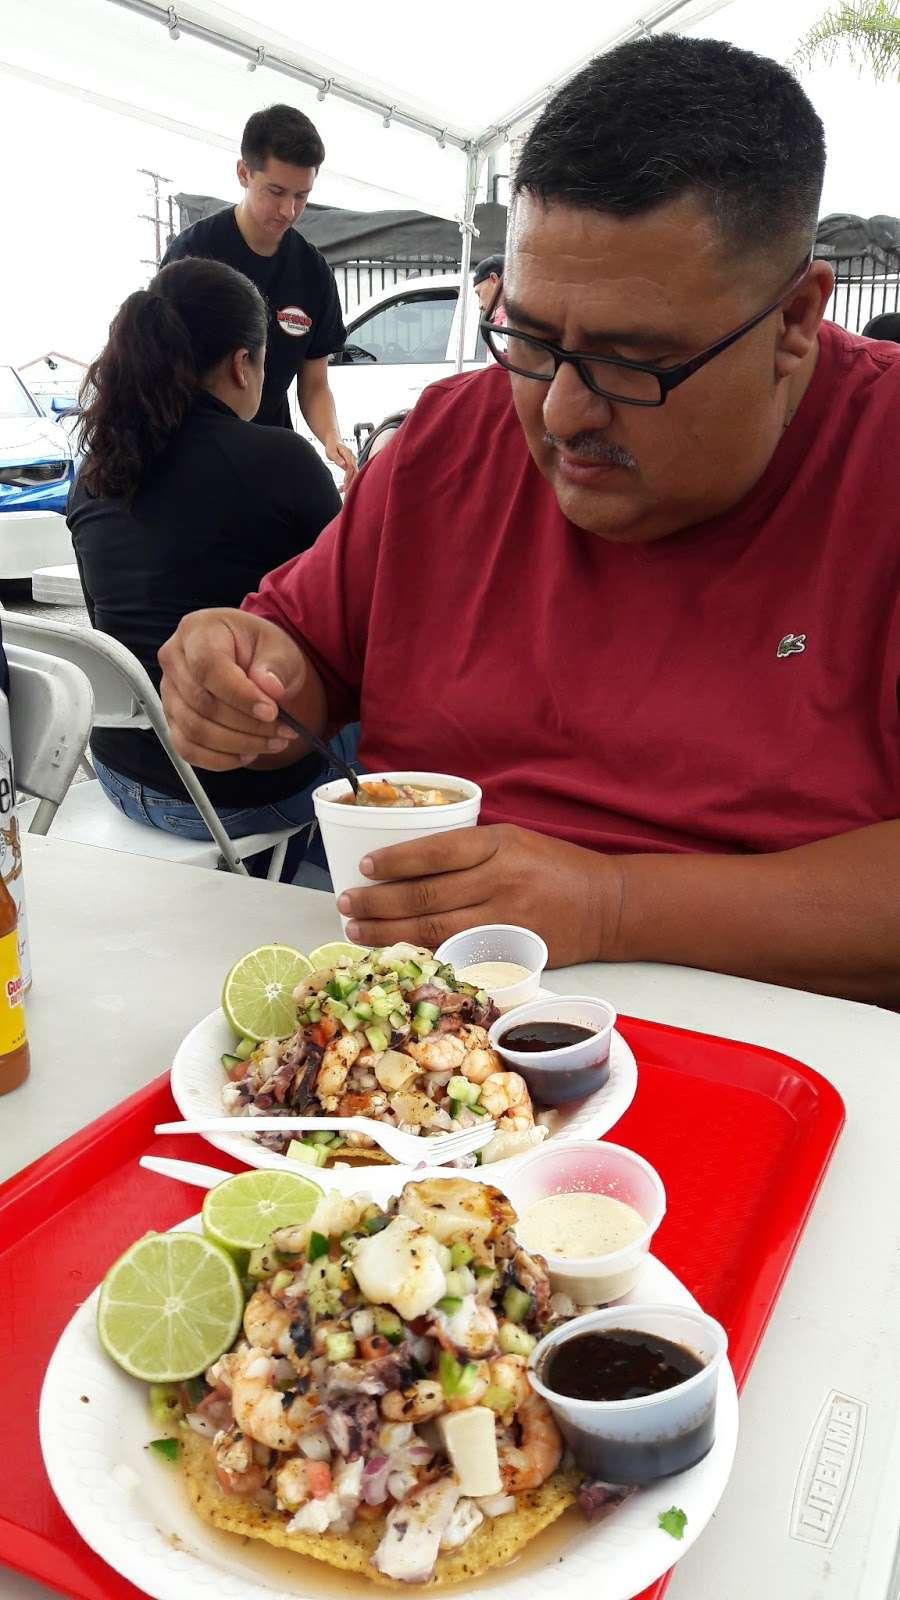 Mariscos Tocho - restaurant  | Photo 6 of 10 | Address: 11299 Alameda St, Los Angeles, CA 90059, USA | Phone: (562) 415-7519